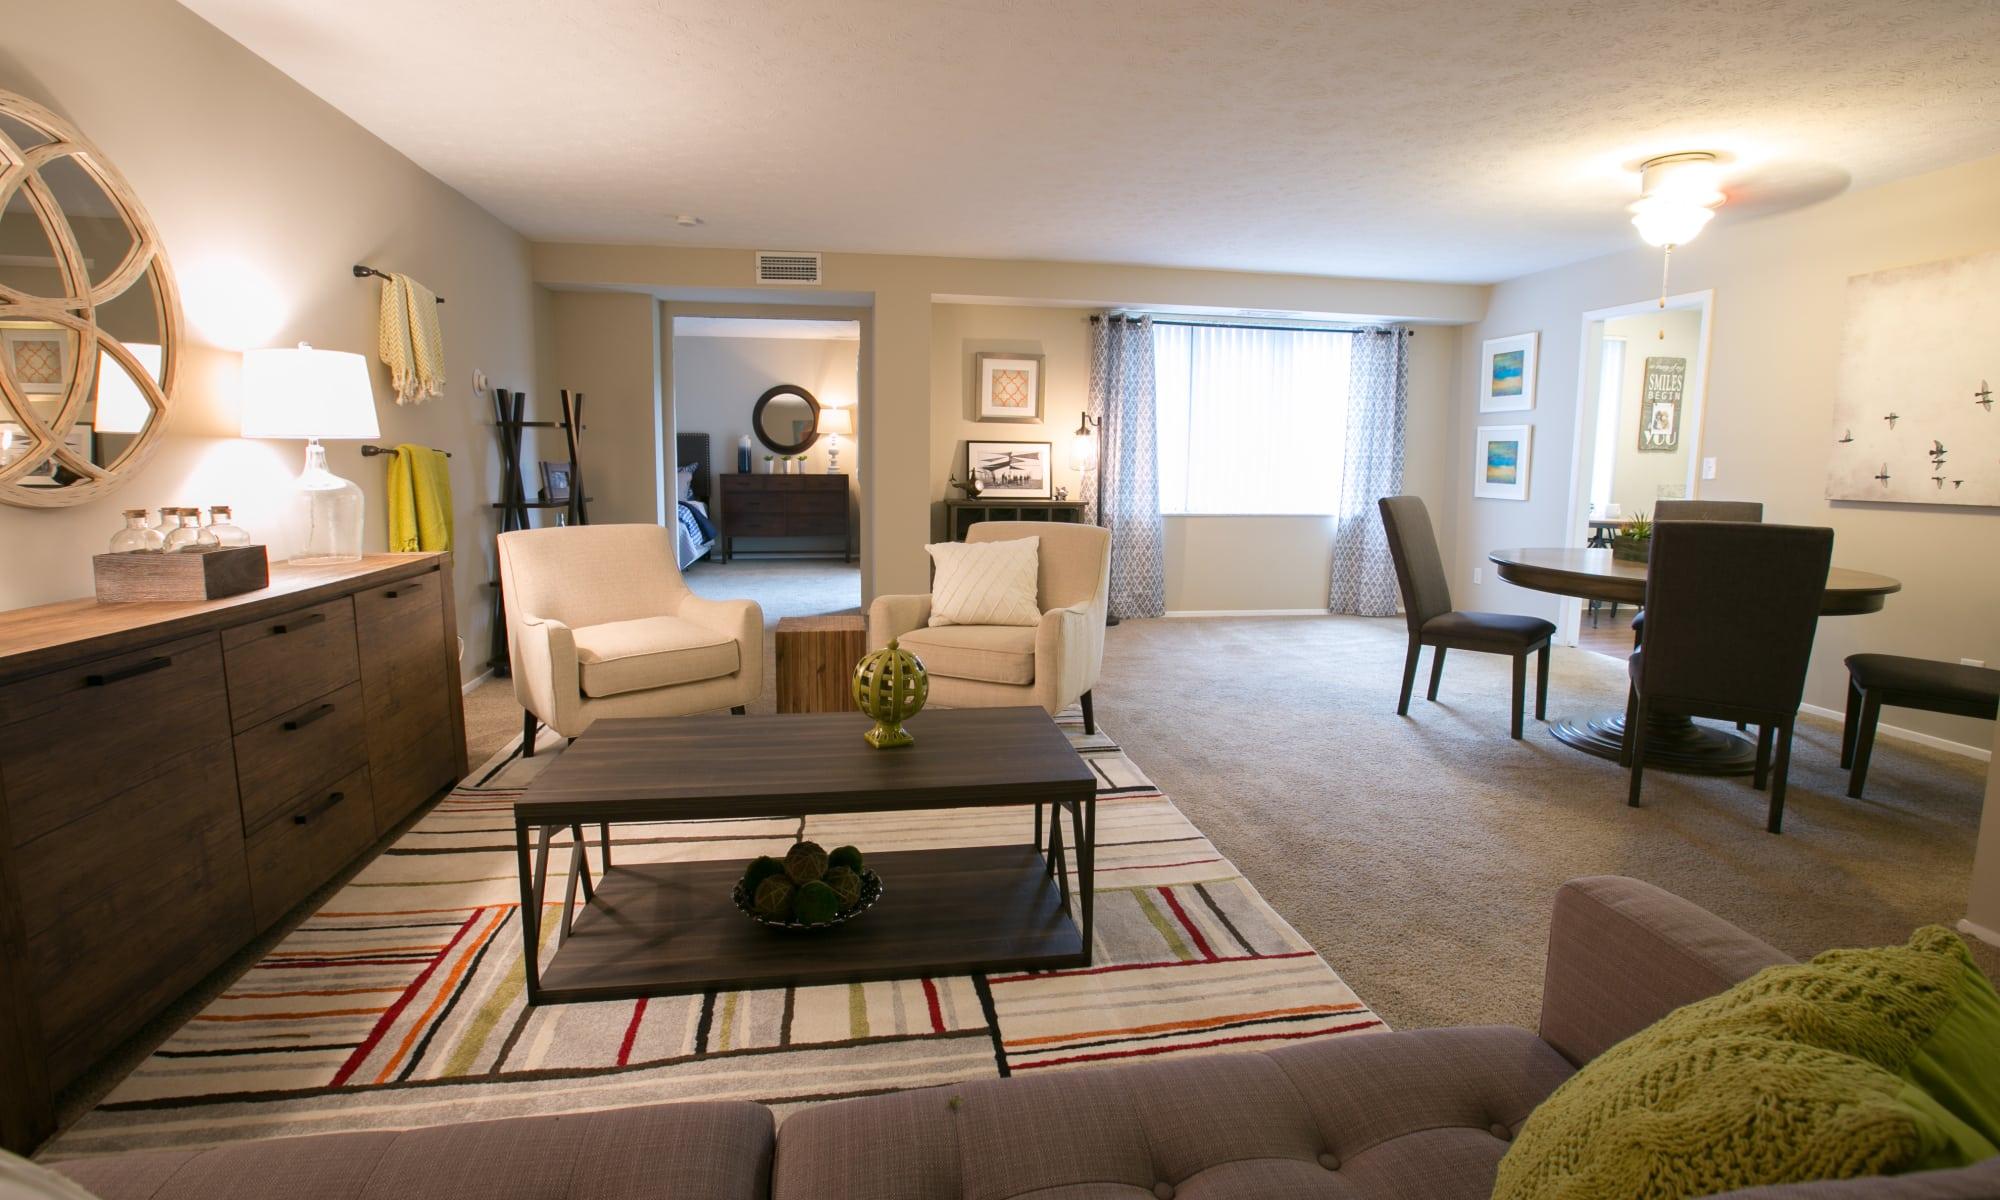 Apartments in Beachwood, OH